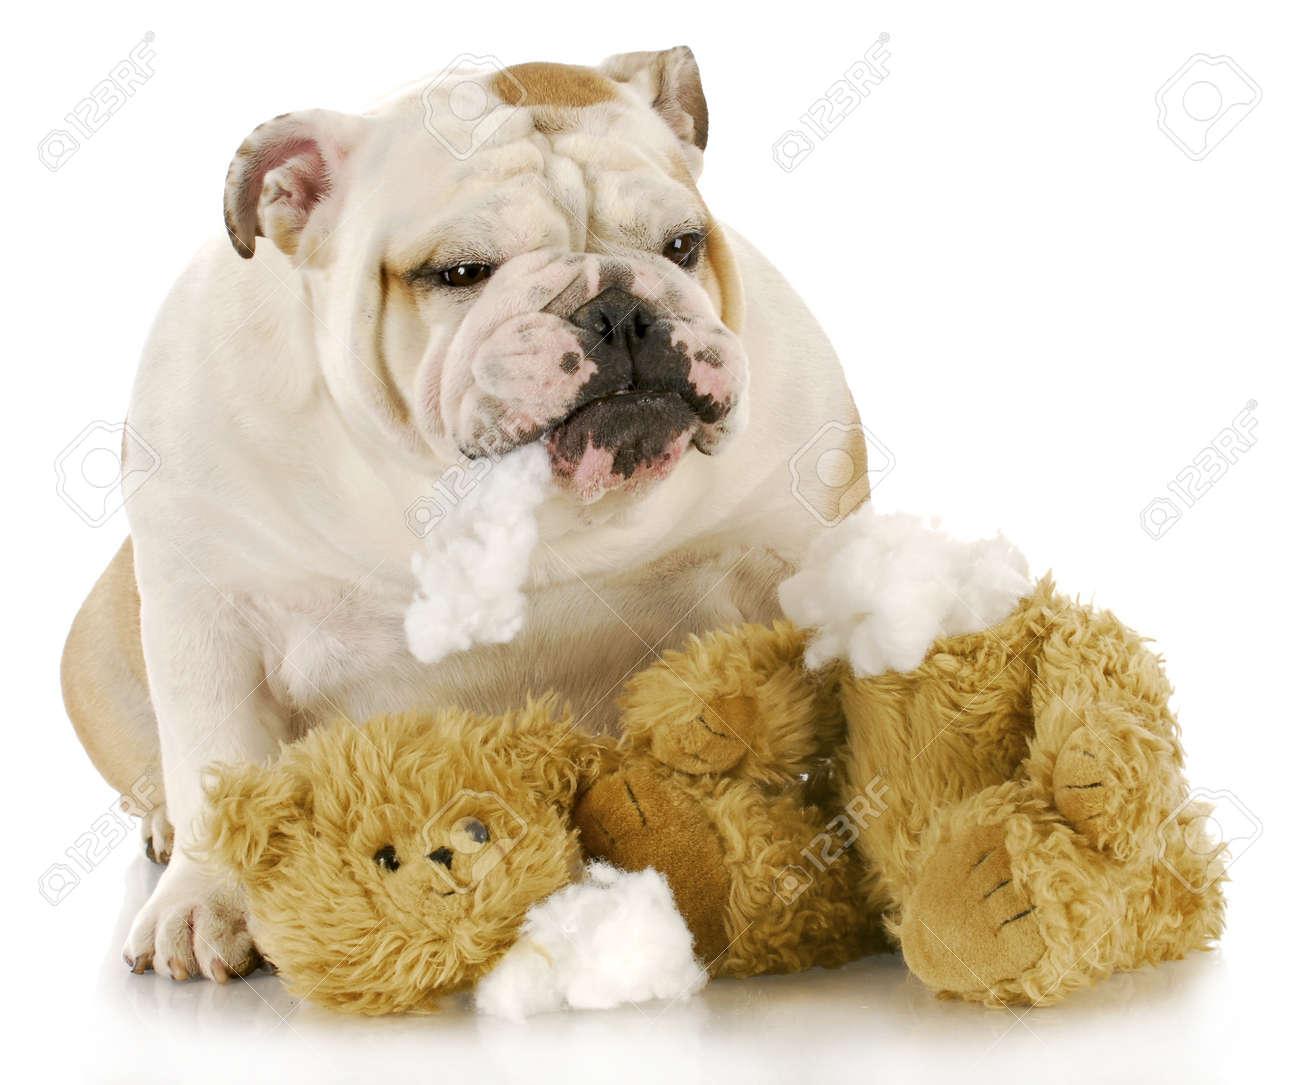 English Bulldog Ripping Apart Stuffed Animal With Reflection Stock